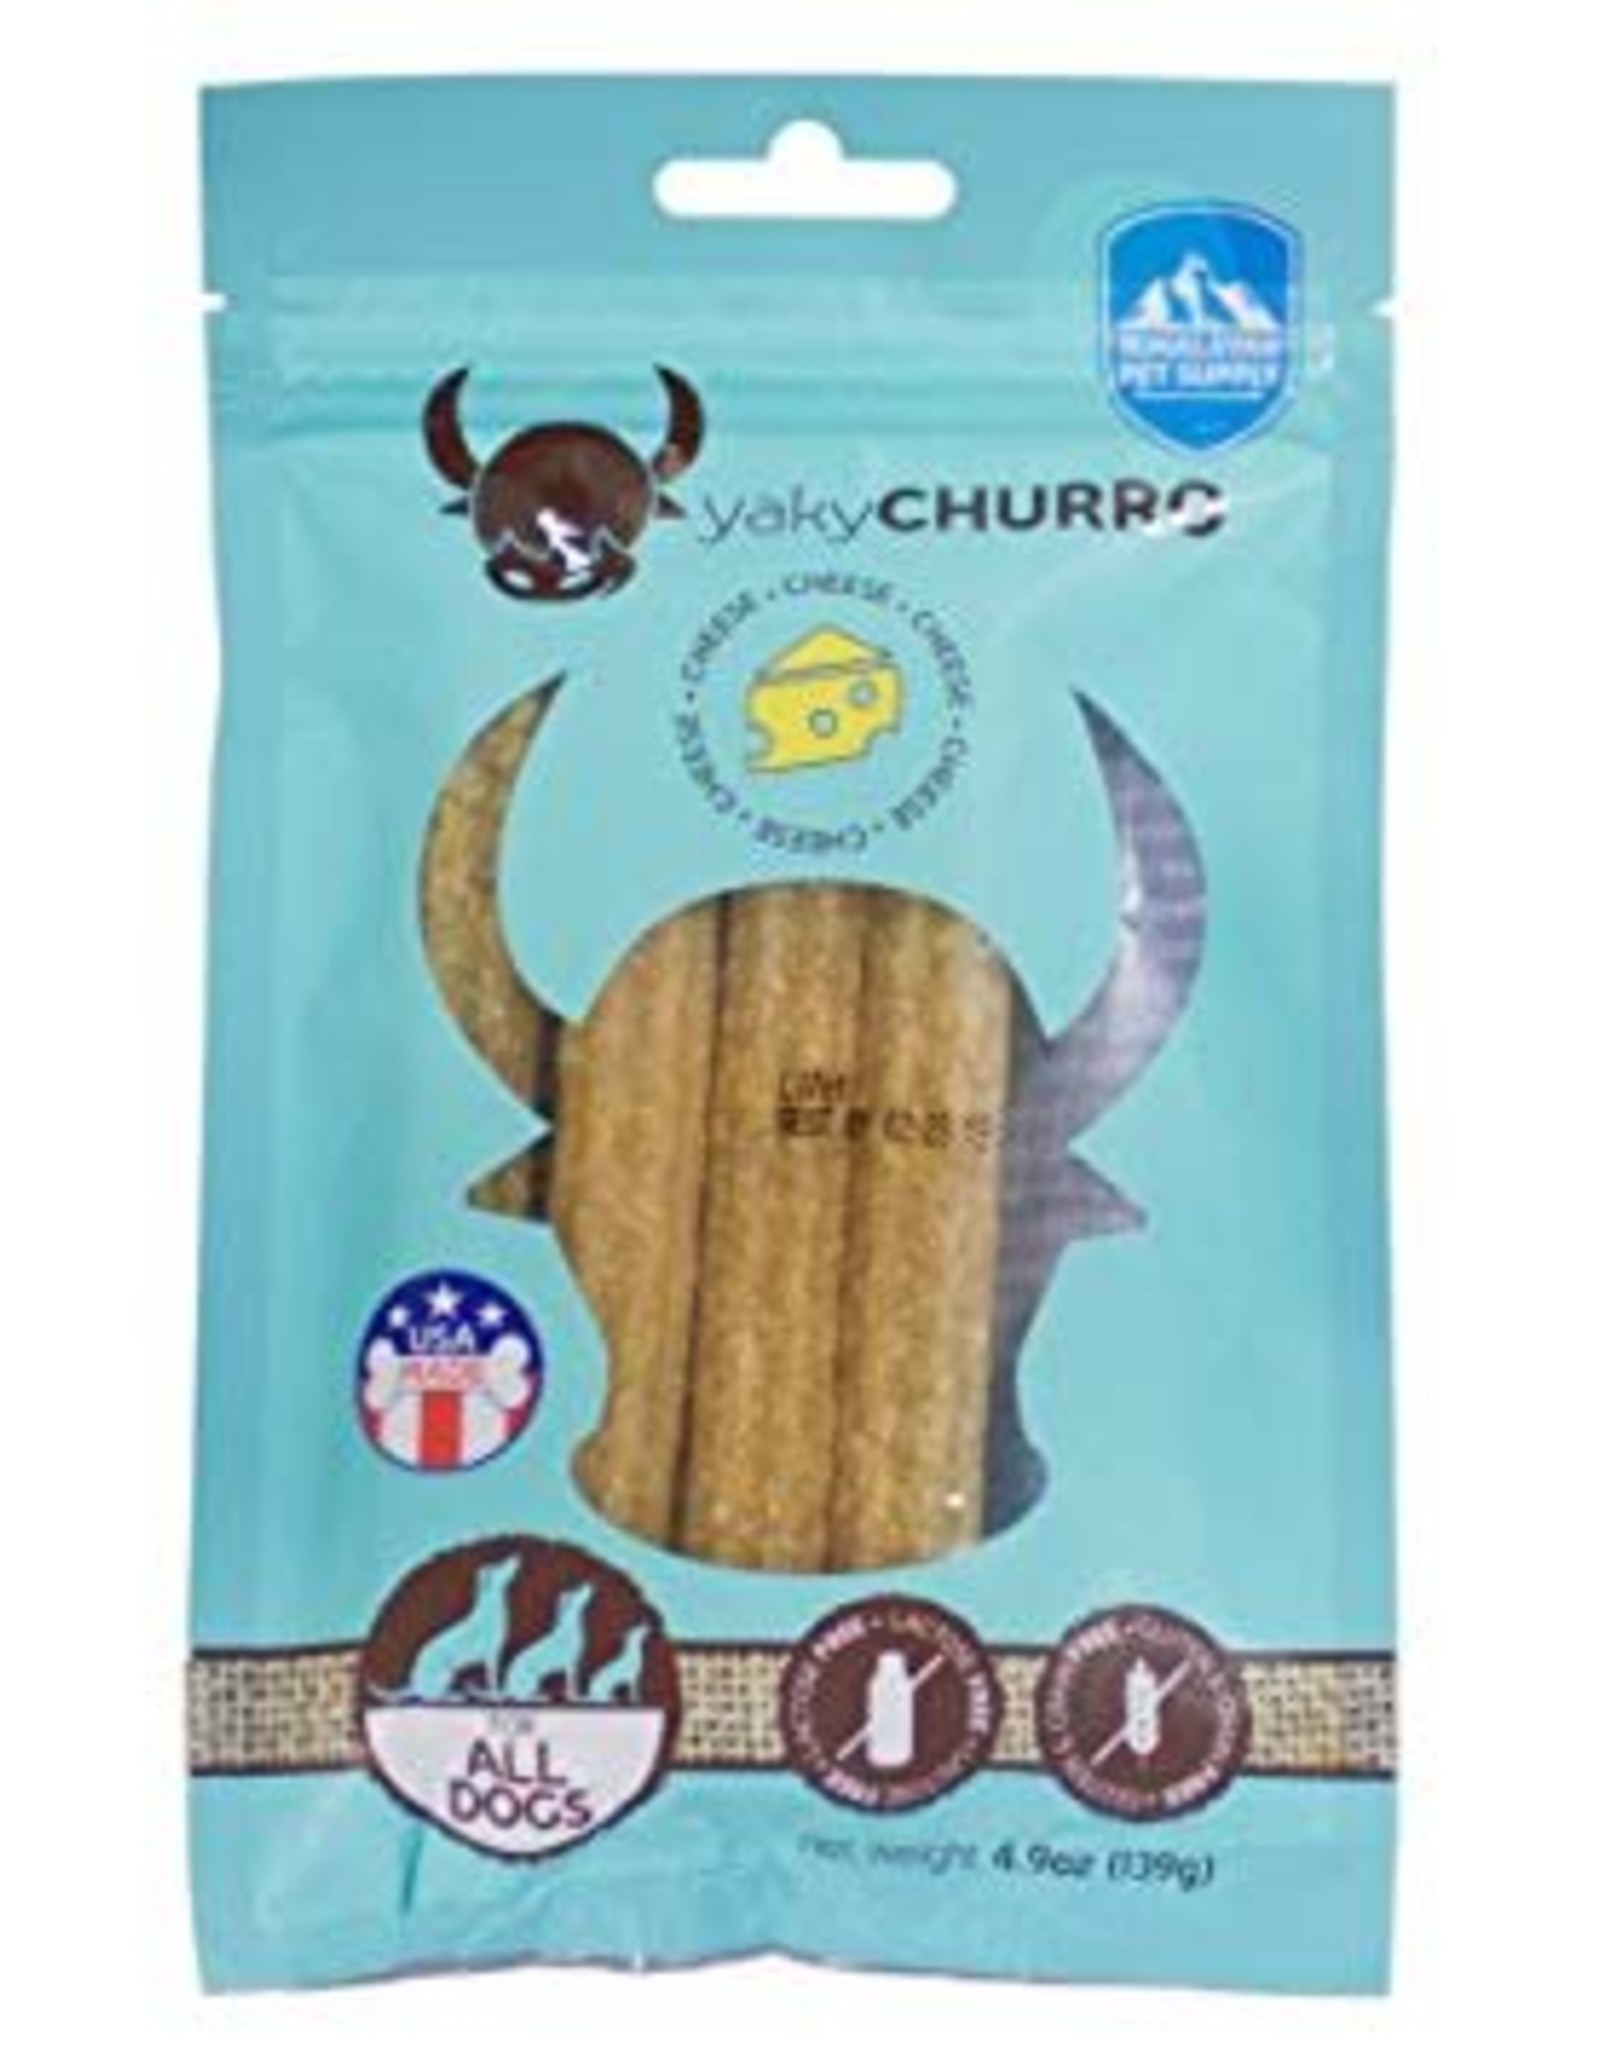 Himalayan Dog Chew Yaky Churro Cheese Dog Treats, 4 pack